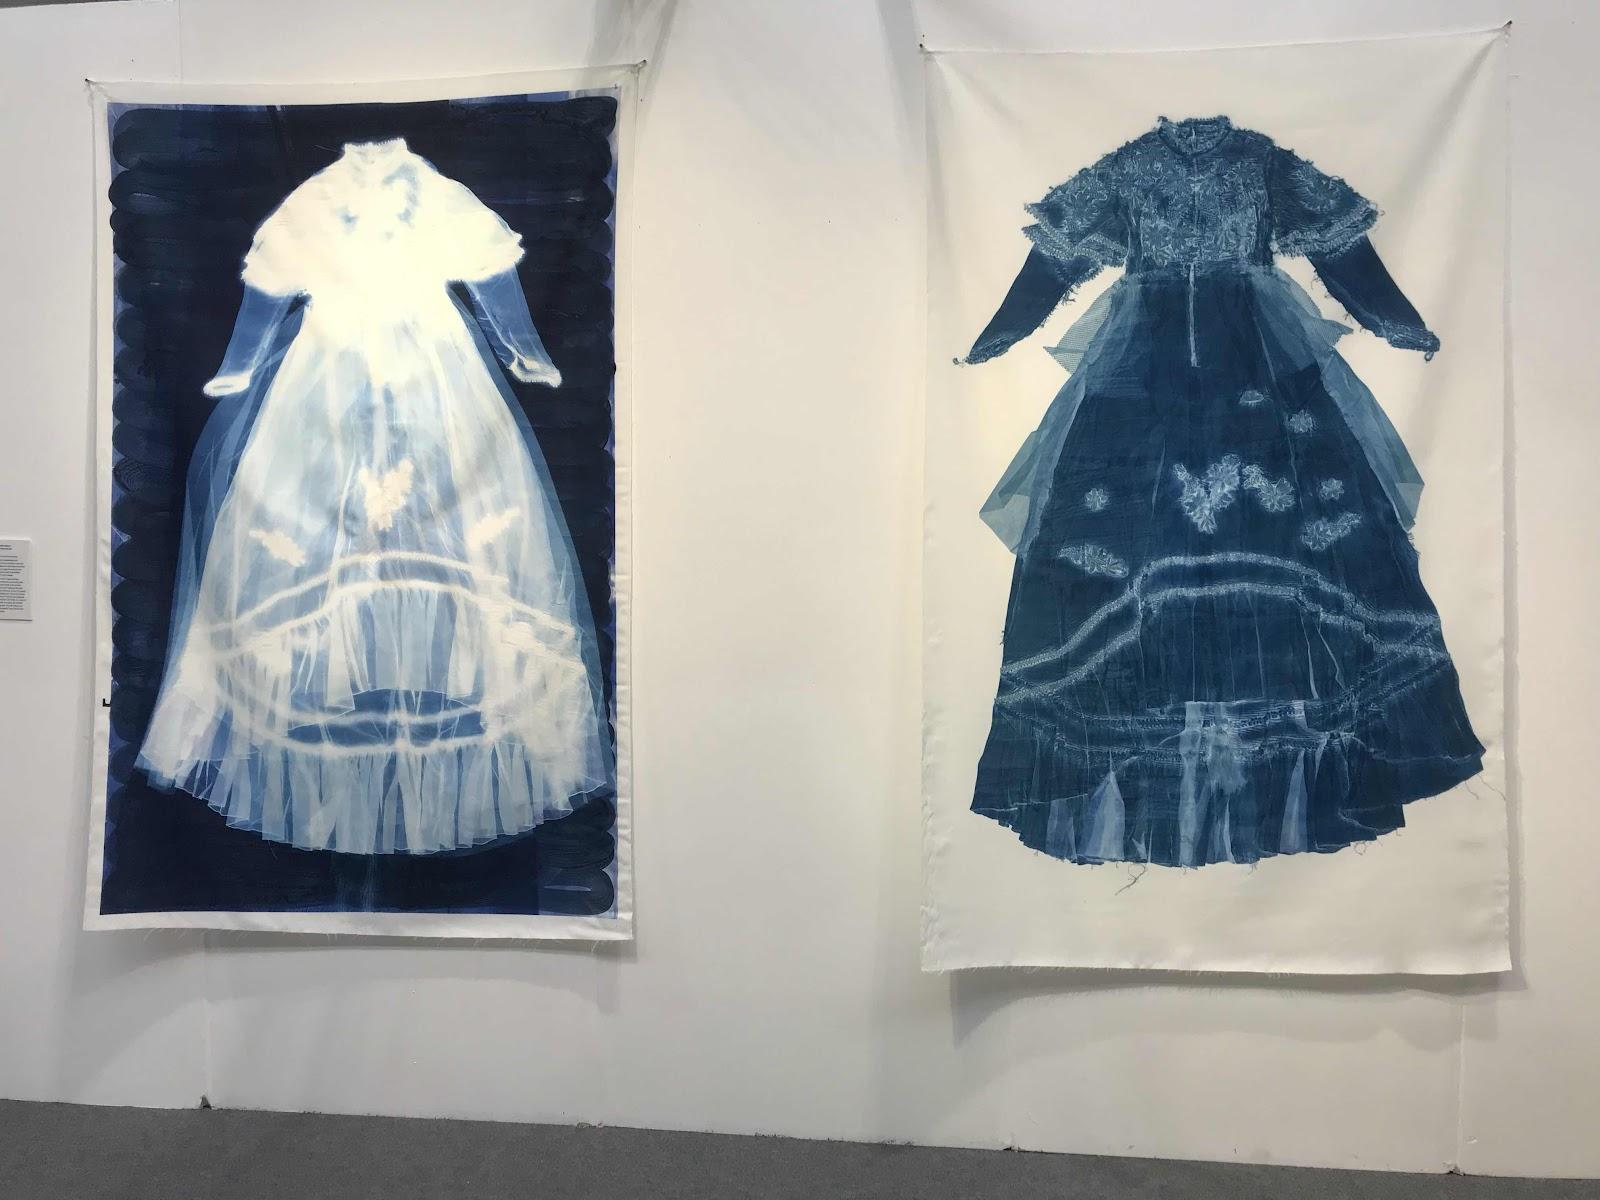 Cyanotypes quilt